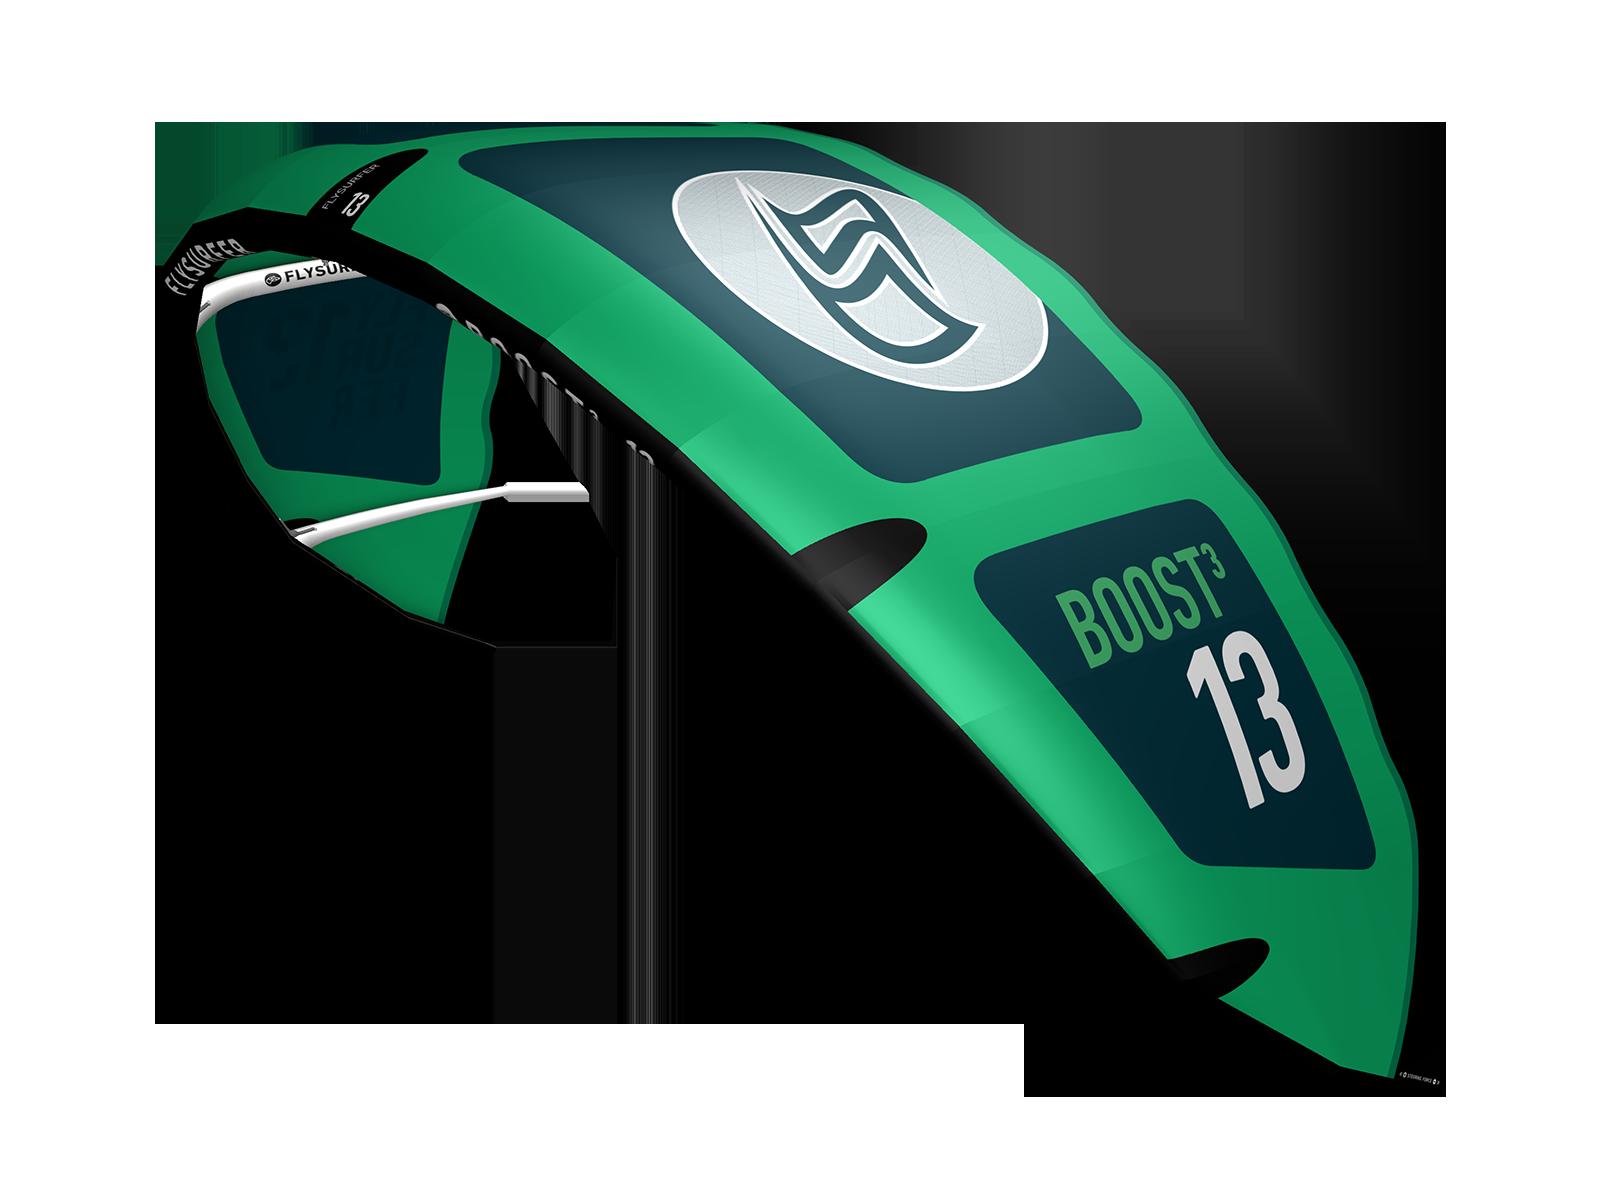 BOOST3-3D-13